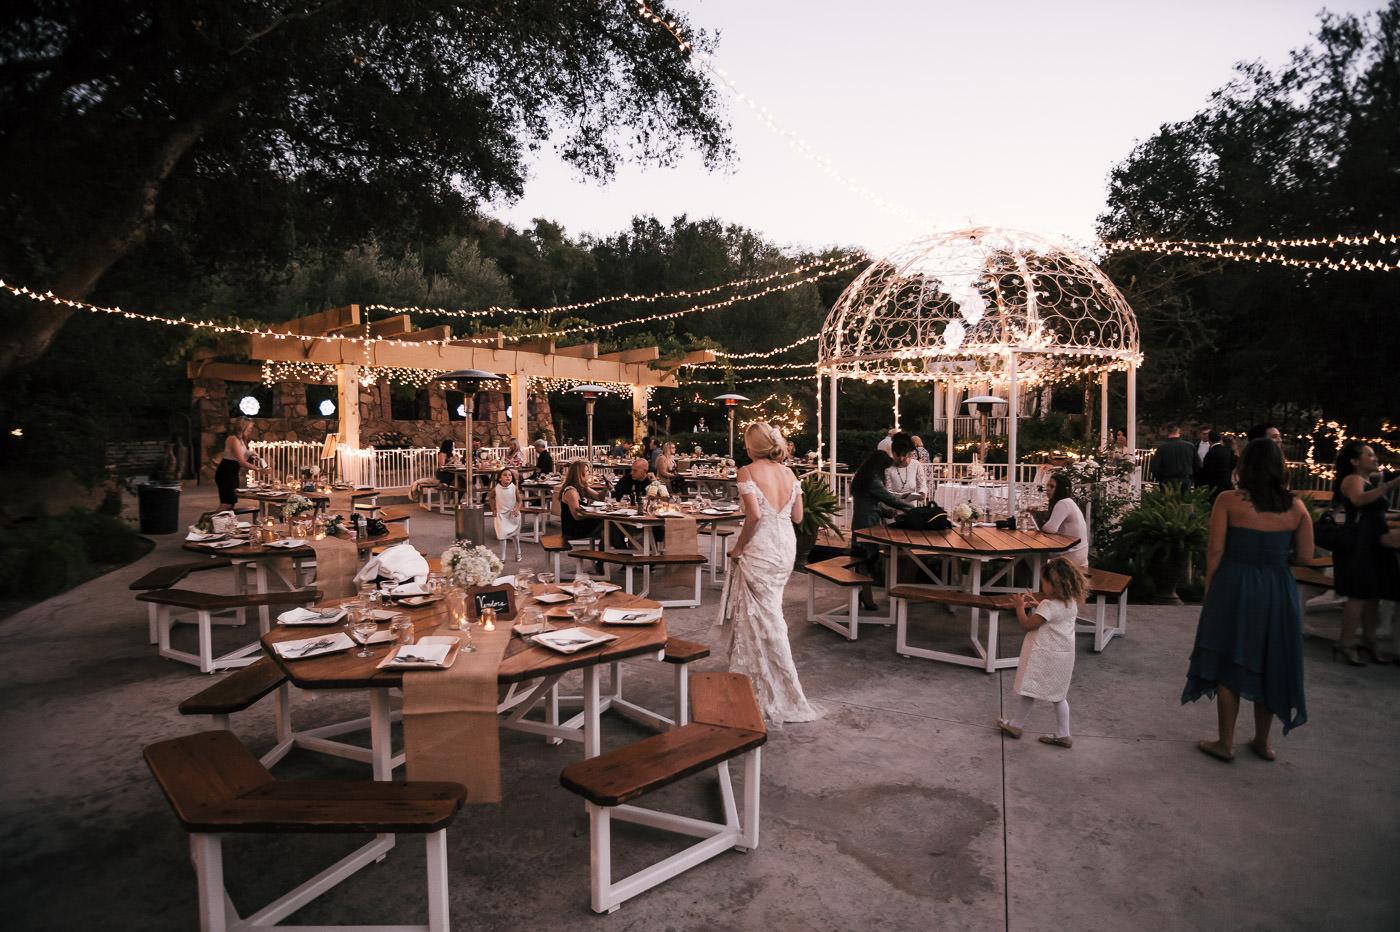 beautiful wedding venue in temecula california the whispering oaks terrace